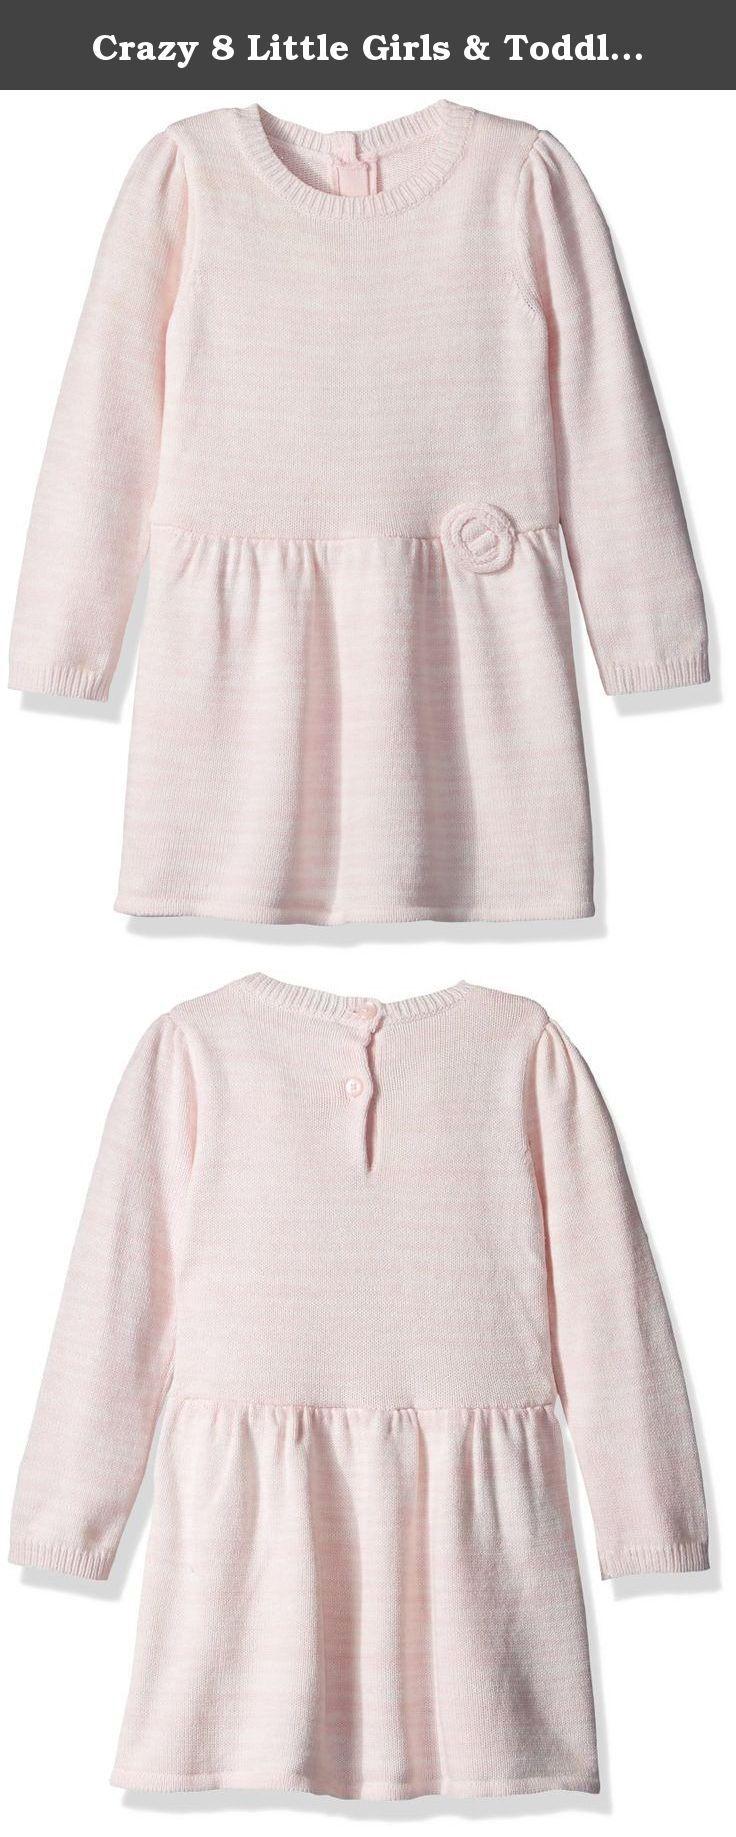 Crazy little girls u toddler looped sweater dress pink y loop